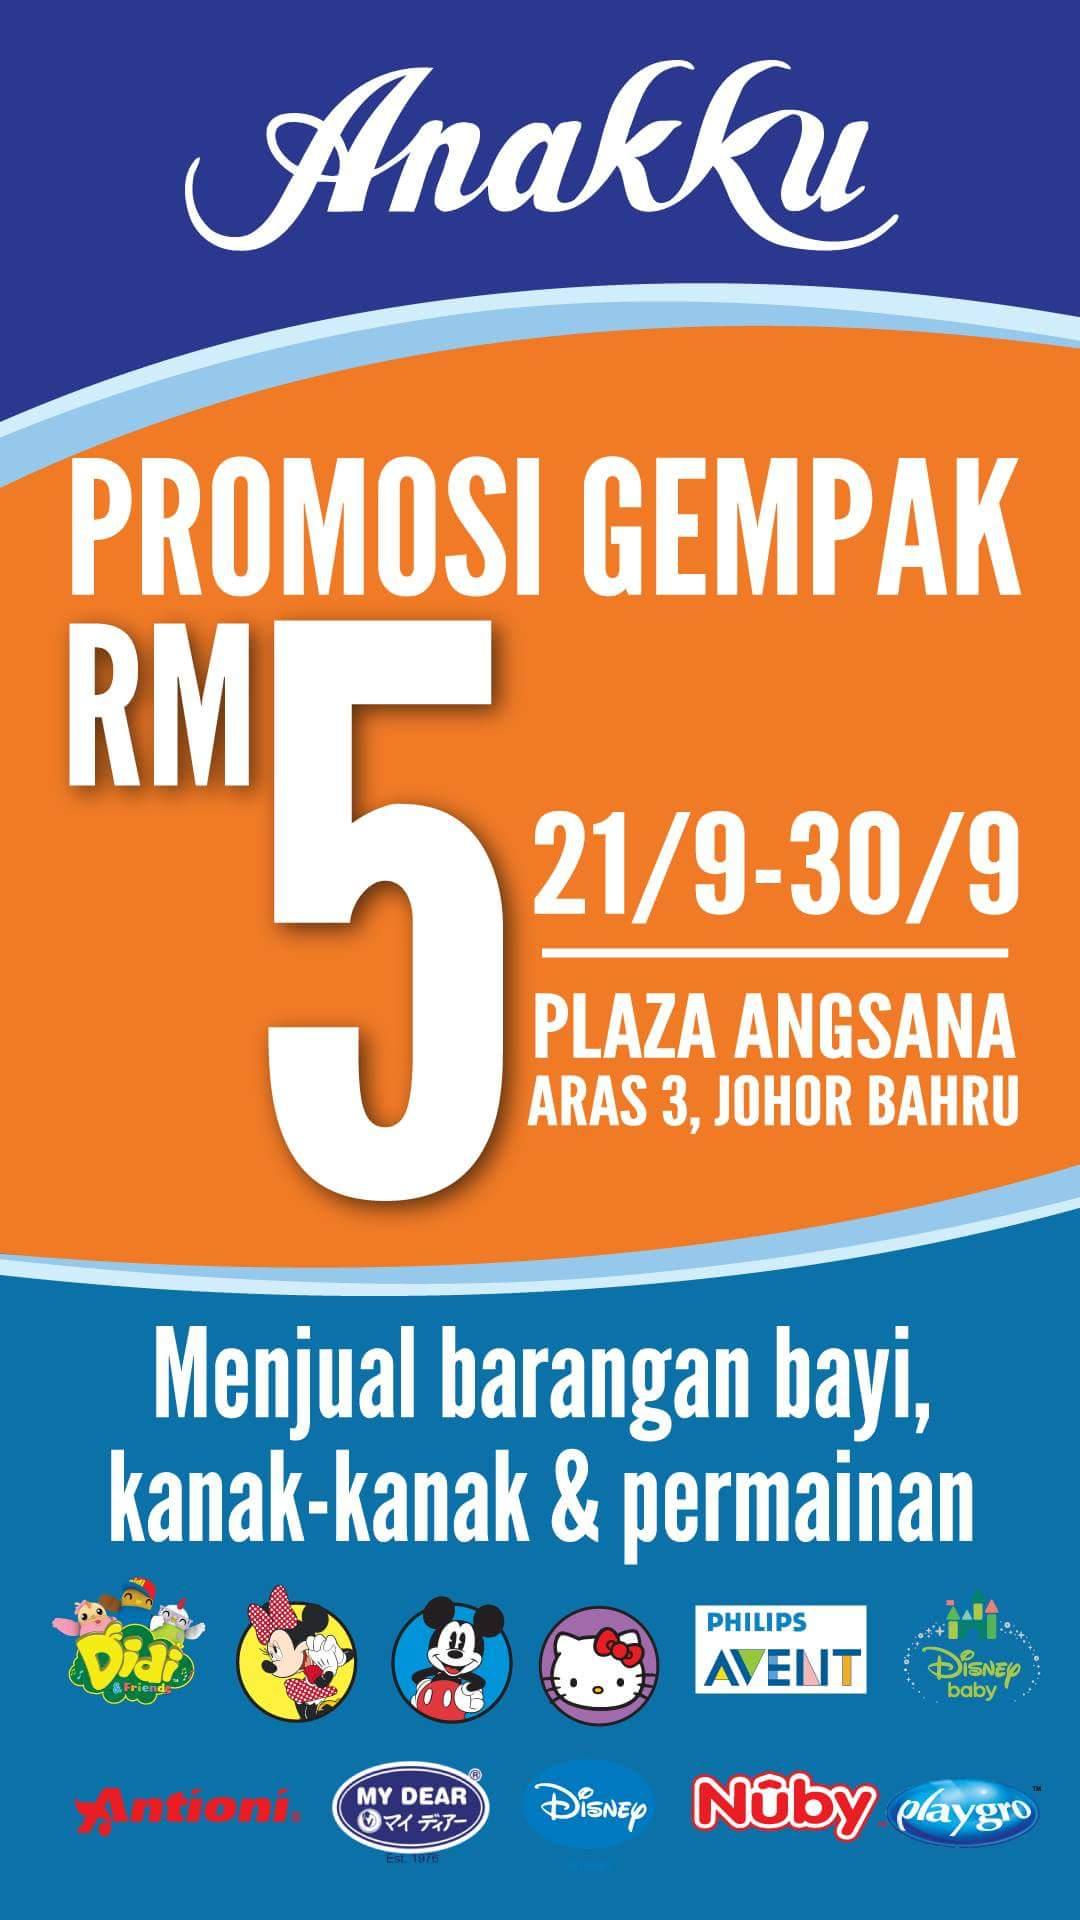 Promosi Gempak RM5 Anakku Plaza Angsana 21-30 Sept 2017